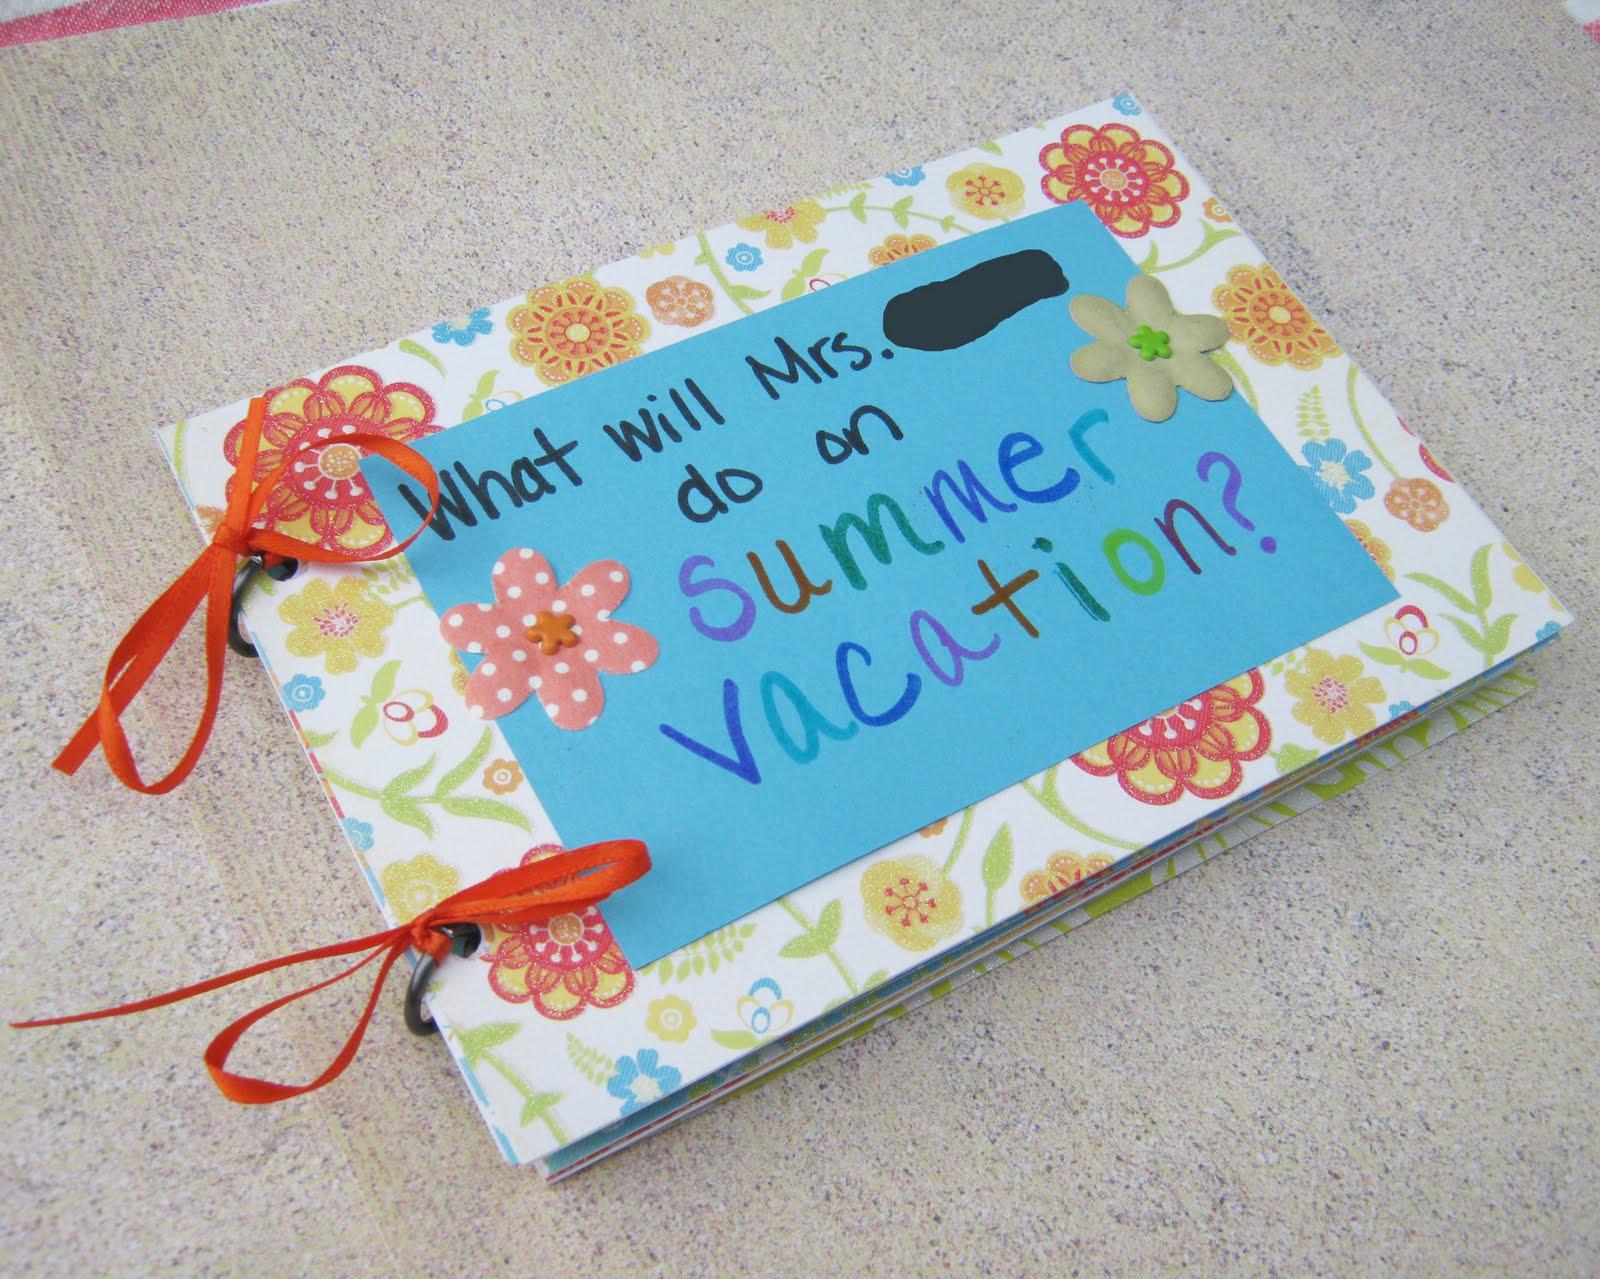 End of year preschool teacher gift. | Ideas for the Kids ... |Preschool Teacher Gifts Books